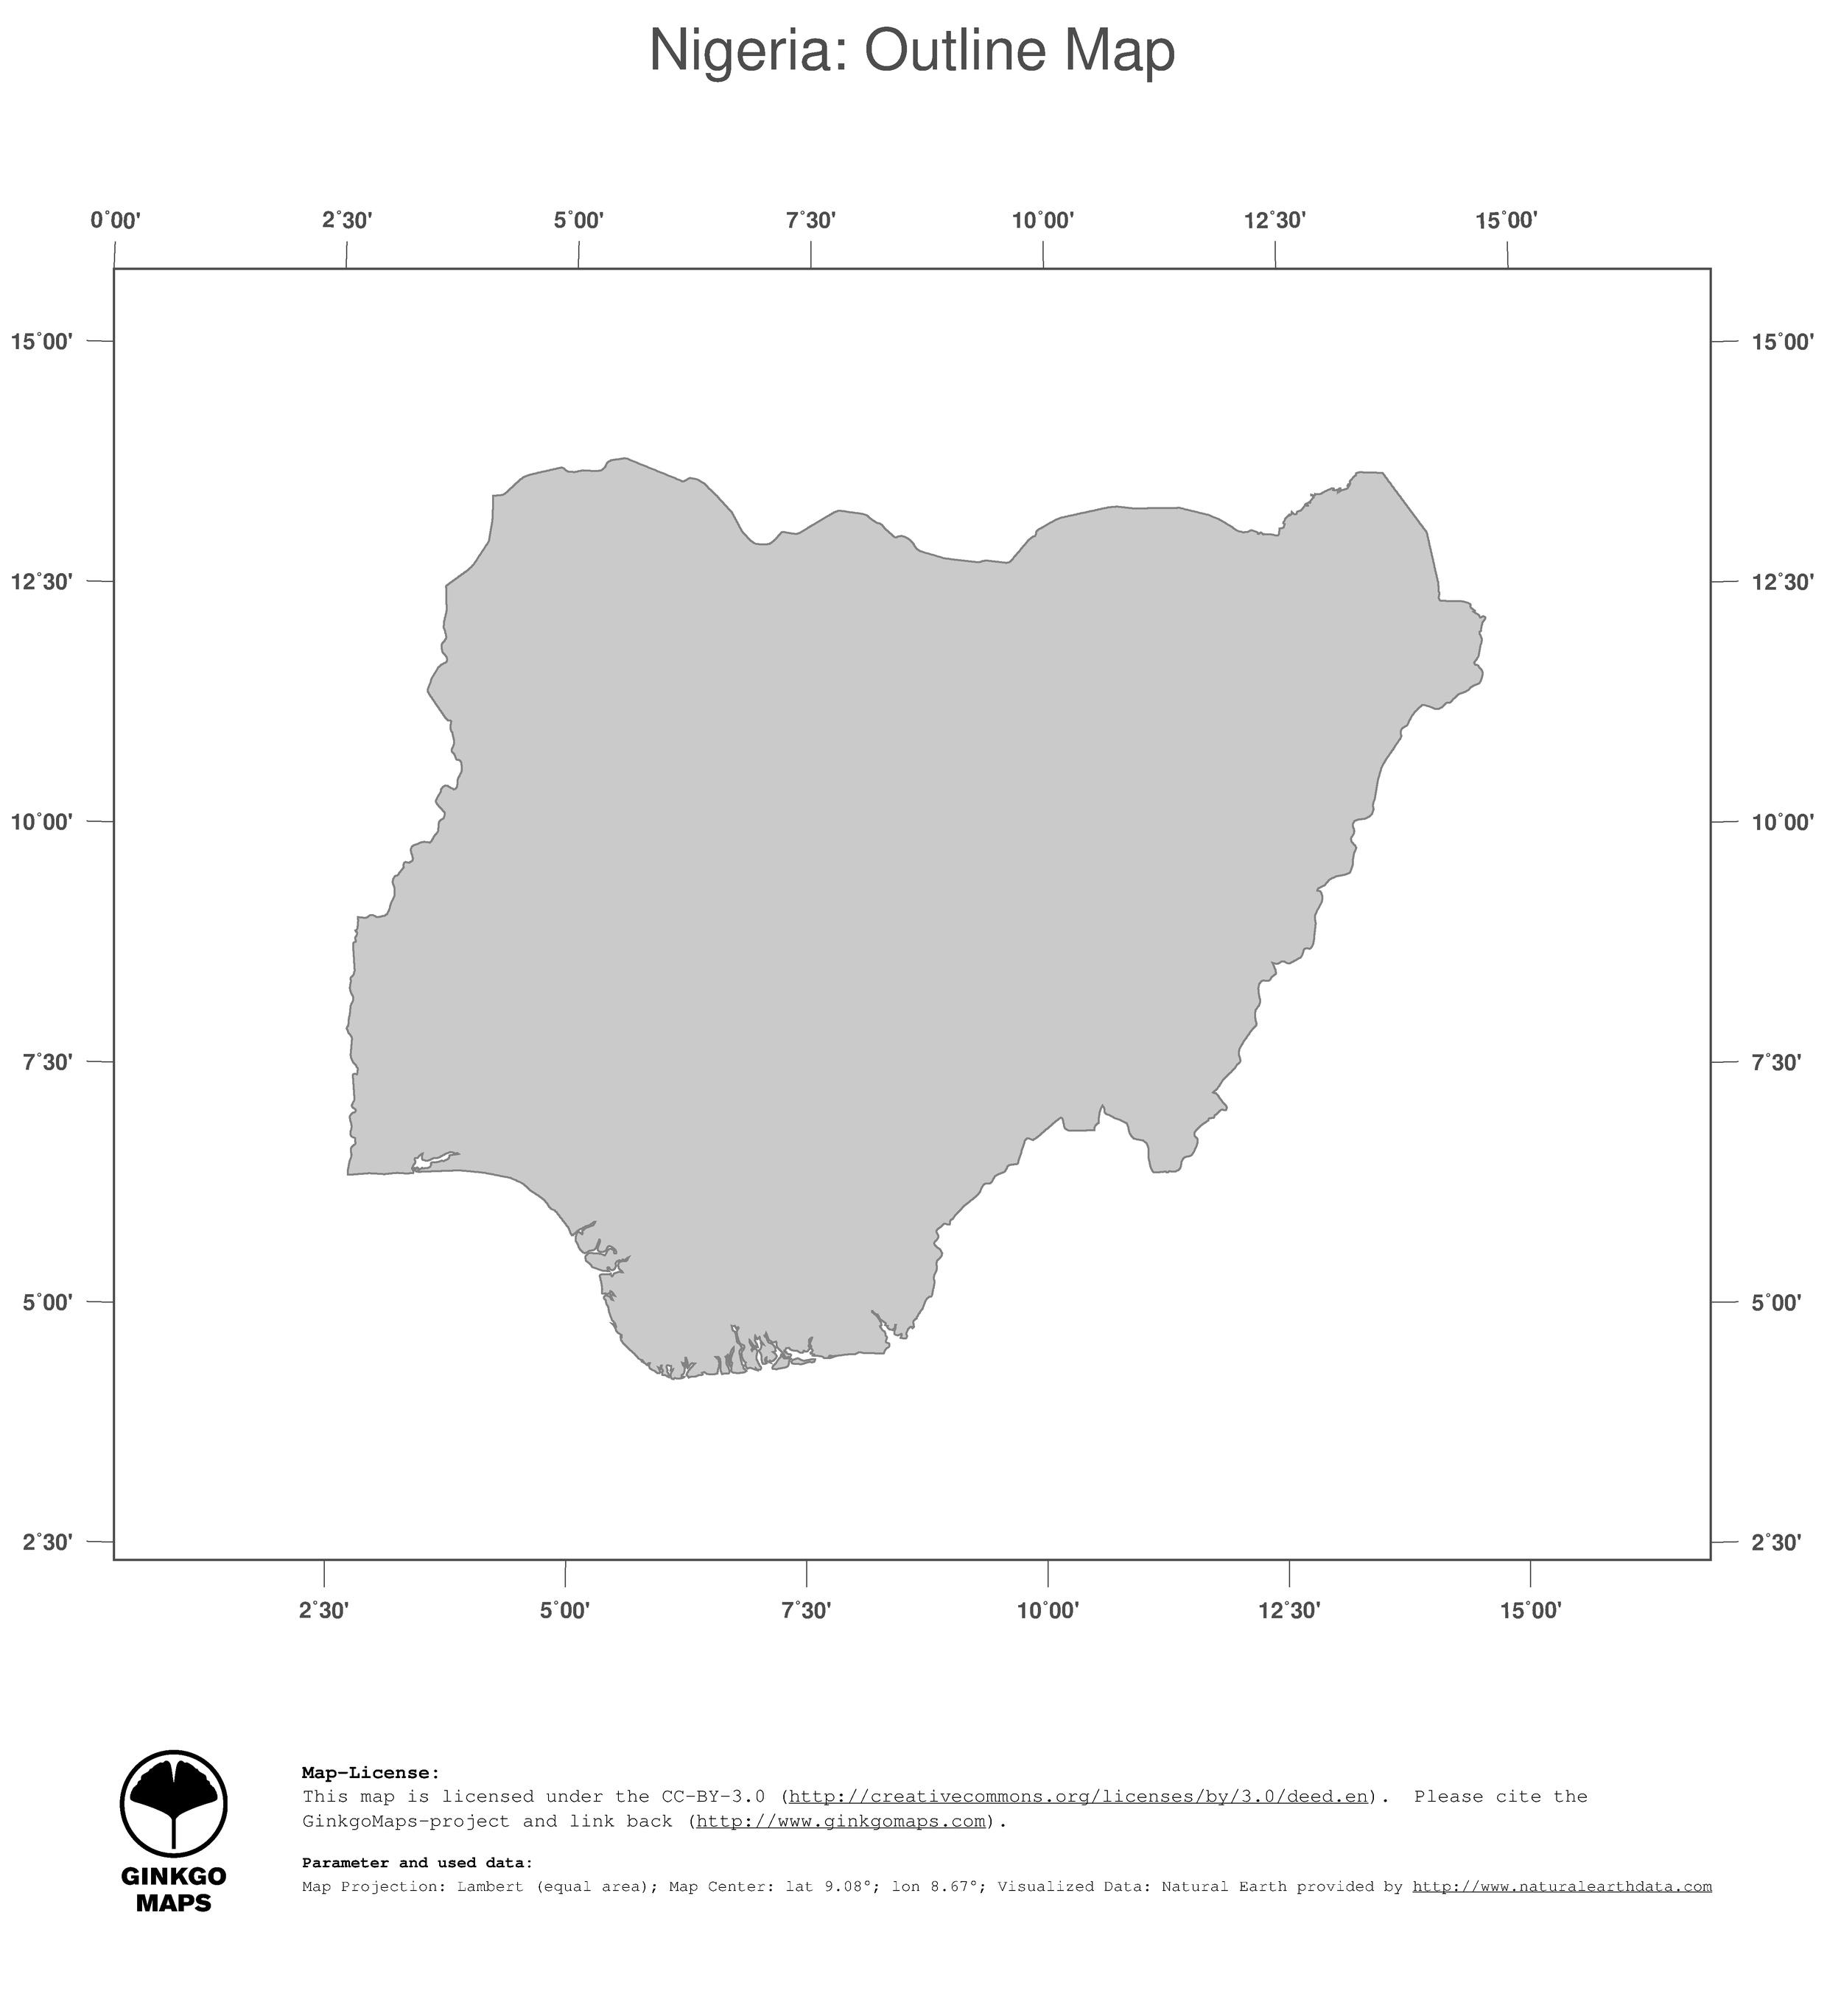 Africa Map Nigeria.Map Nigeria Ginkgomaps Continent Africa Region Nigeria